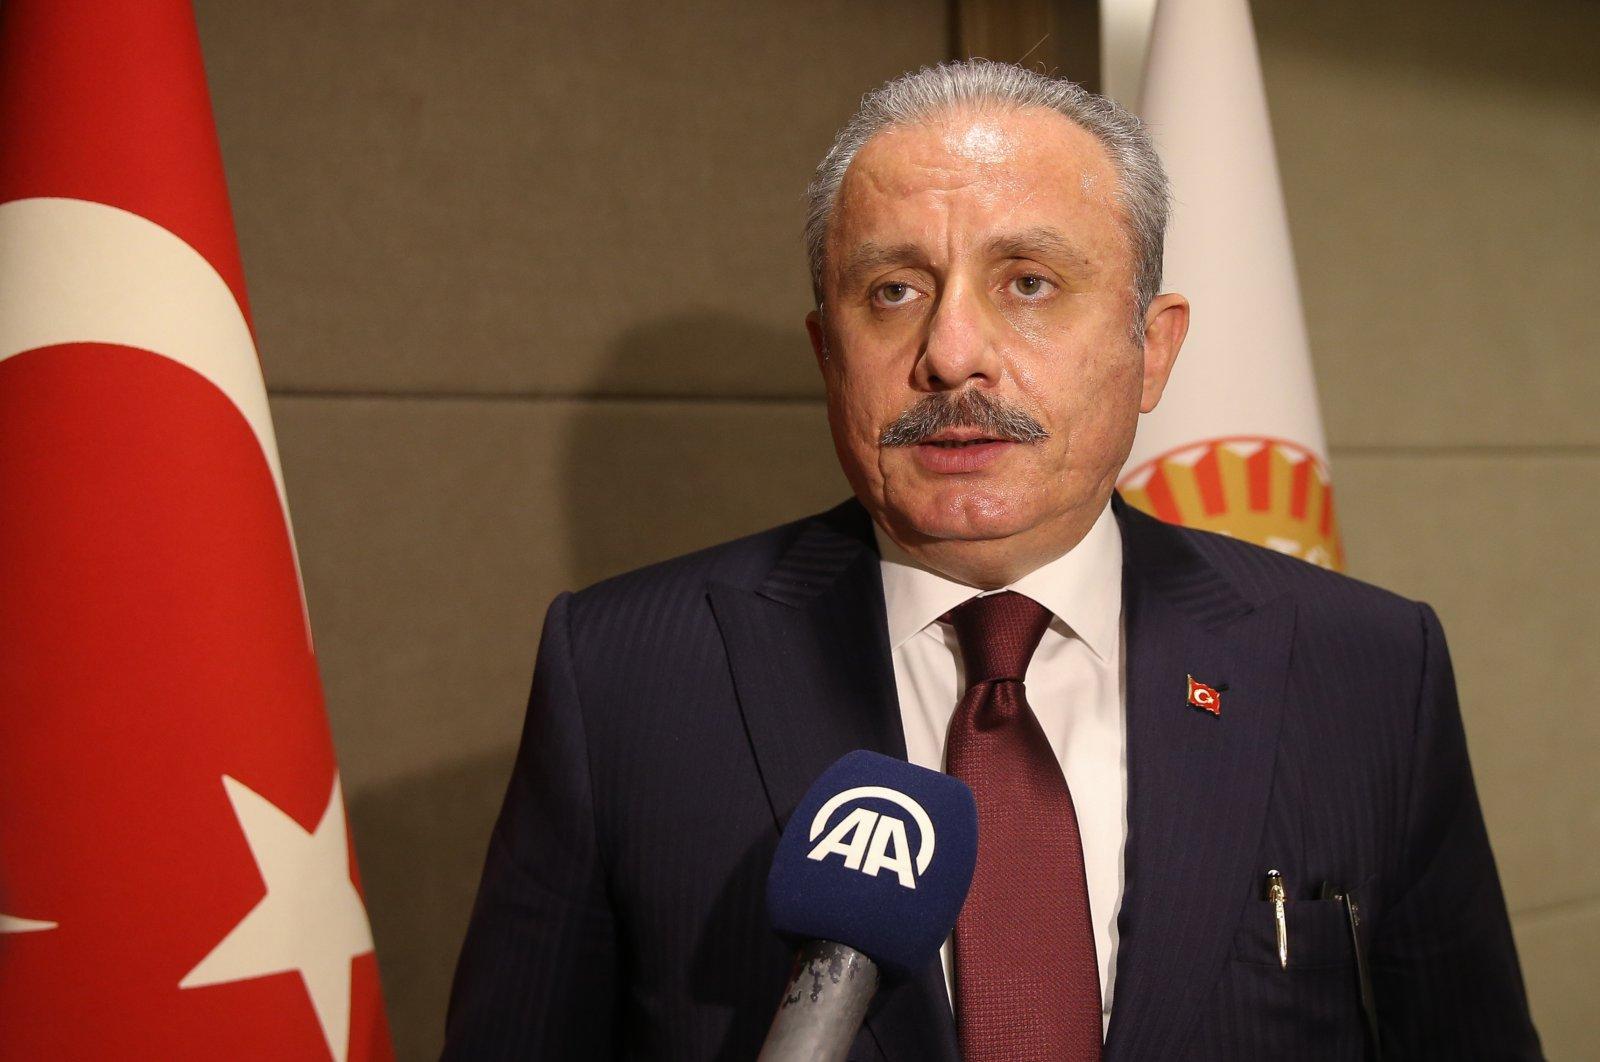 Turkish Parliament Speaker Mustafa Şentop speaks following a conference in Turkey's southern province of Antalya, Turkey, March 25, 2021. (AA Photo)